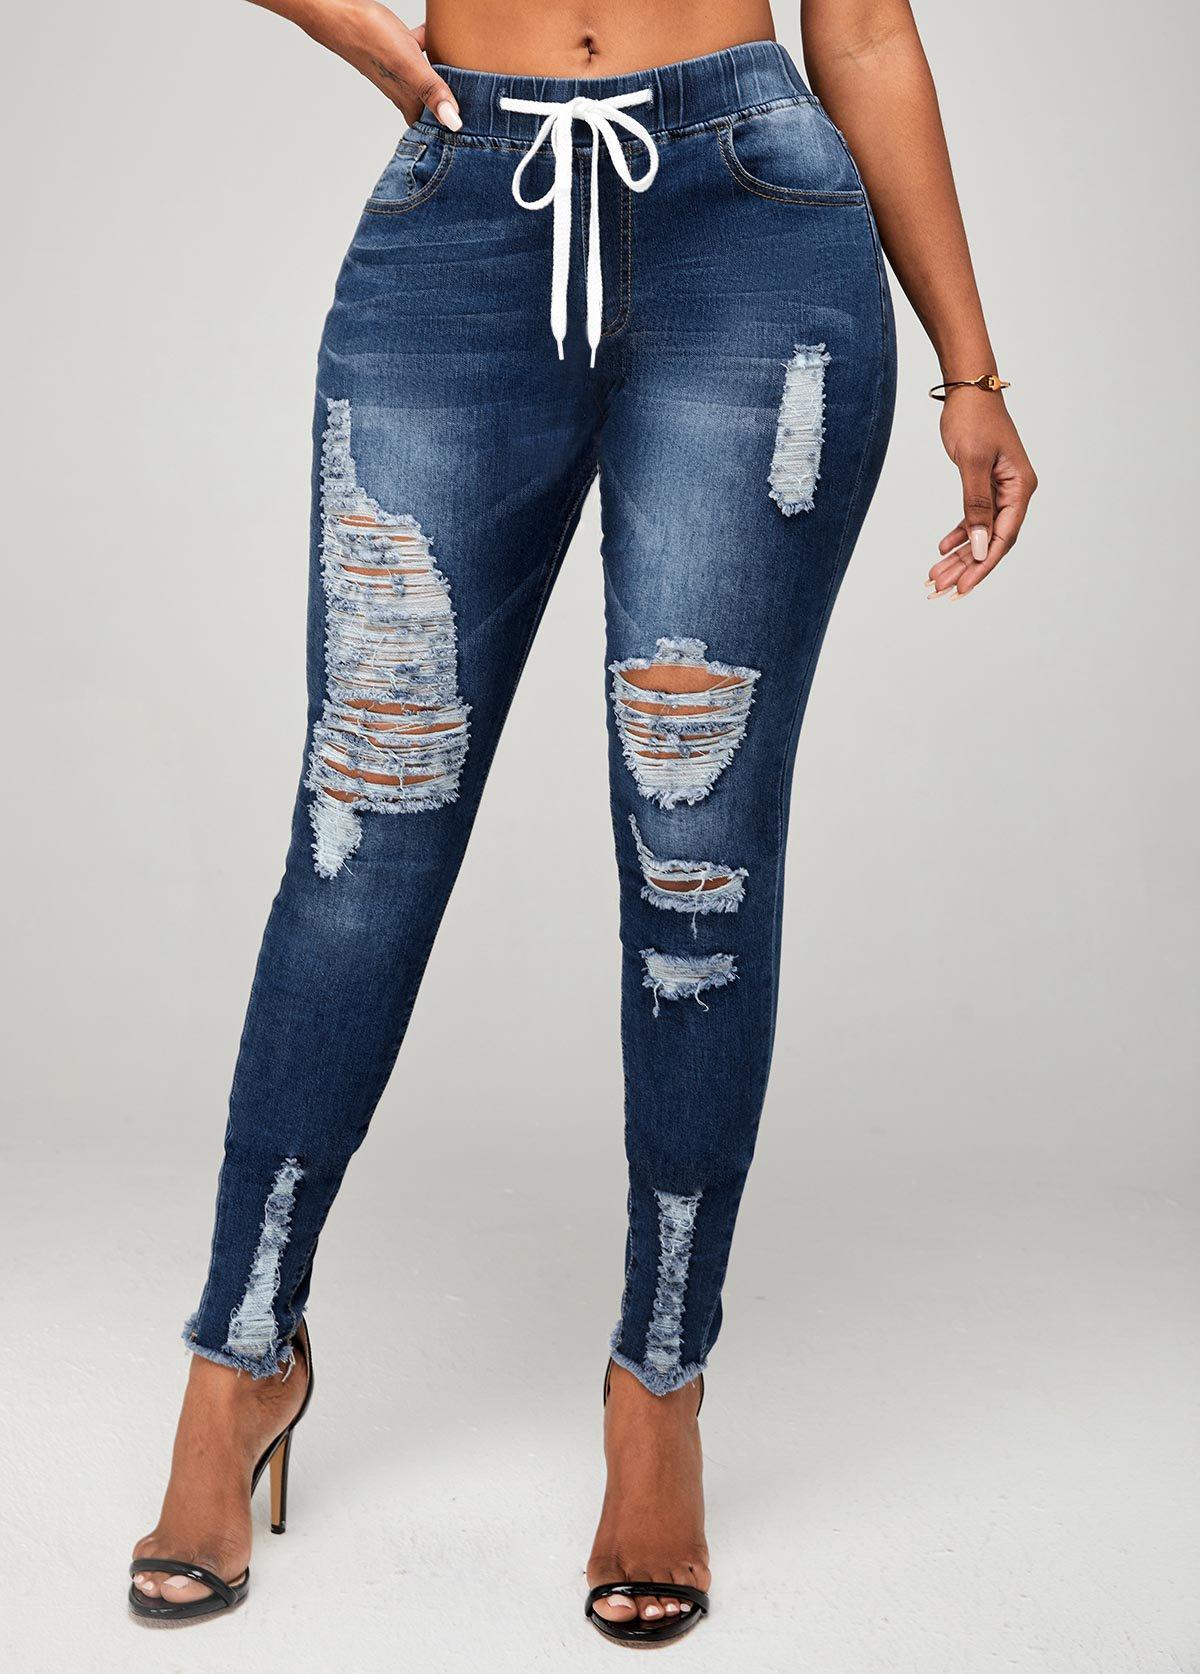 Mid Waist Shredded Skinny Drawstring Detail Jeans